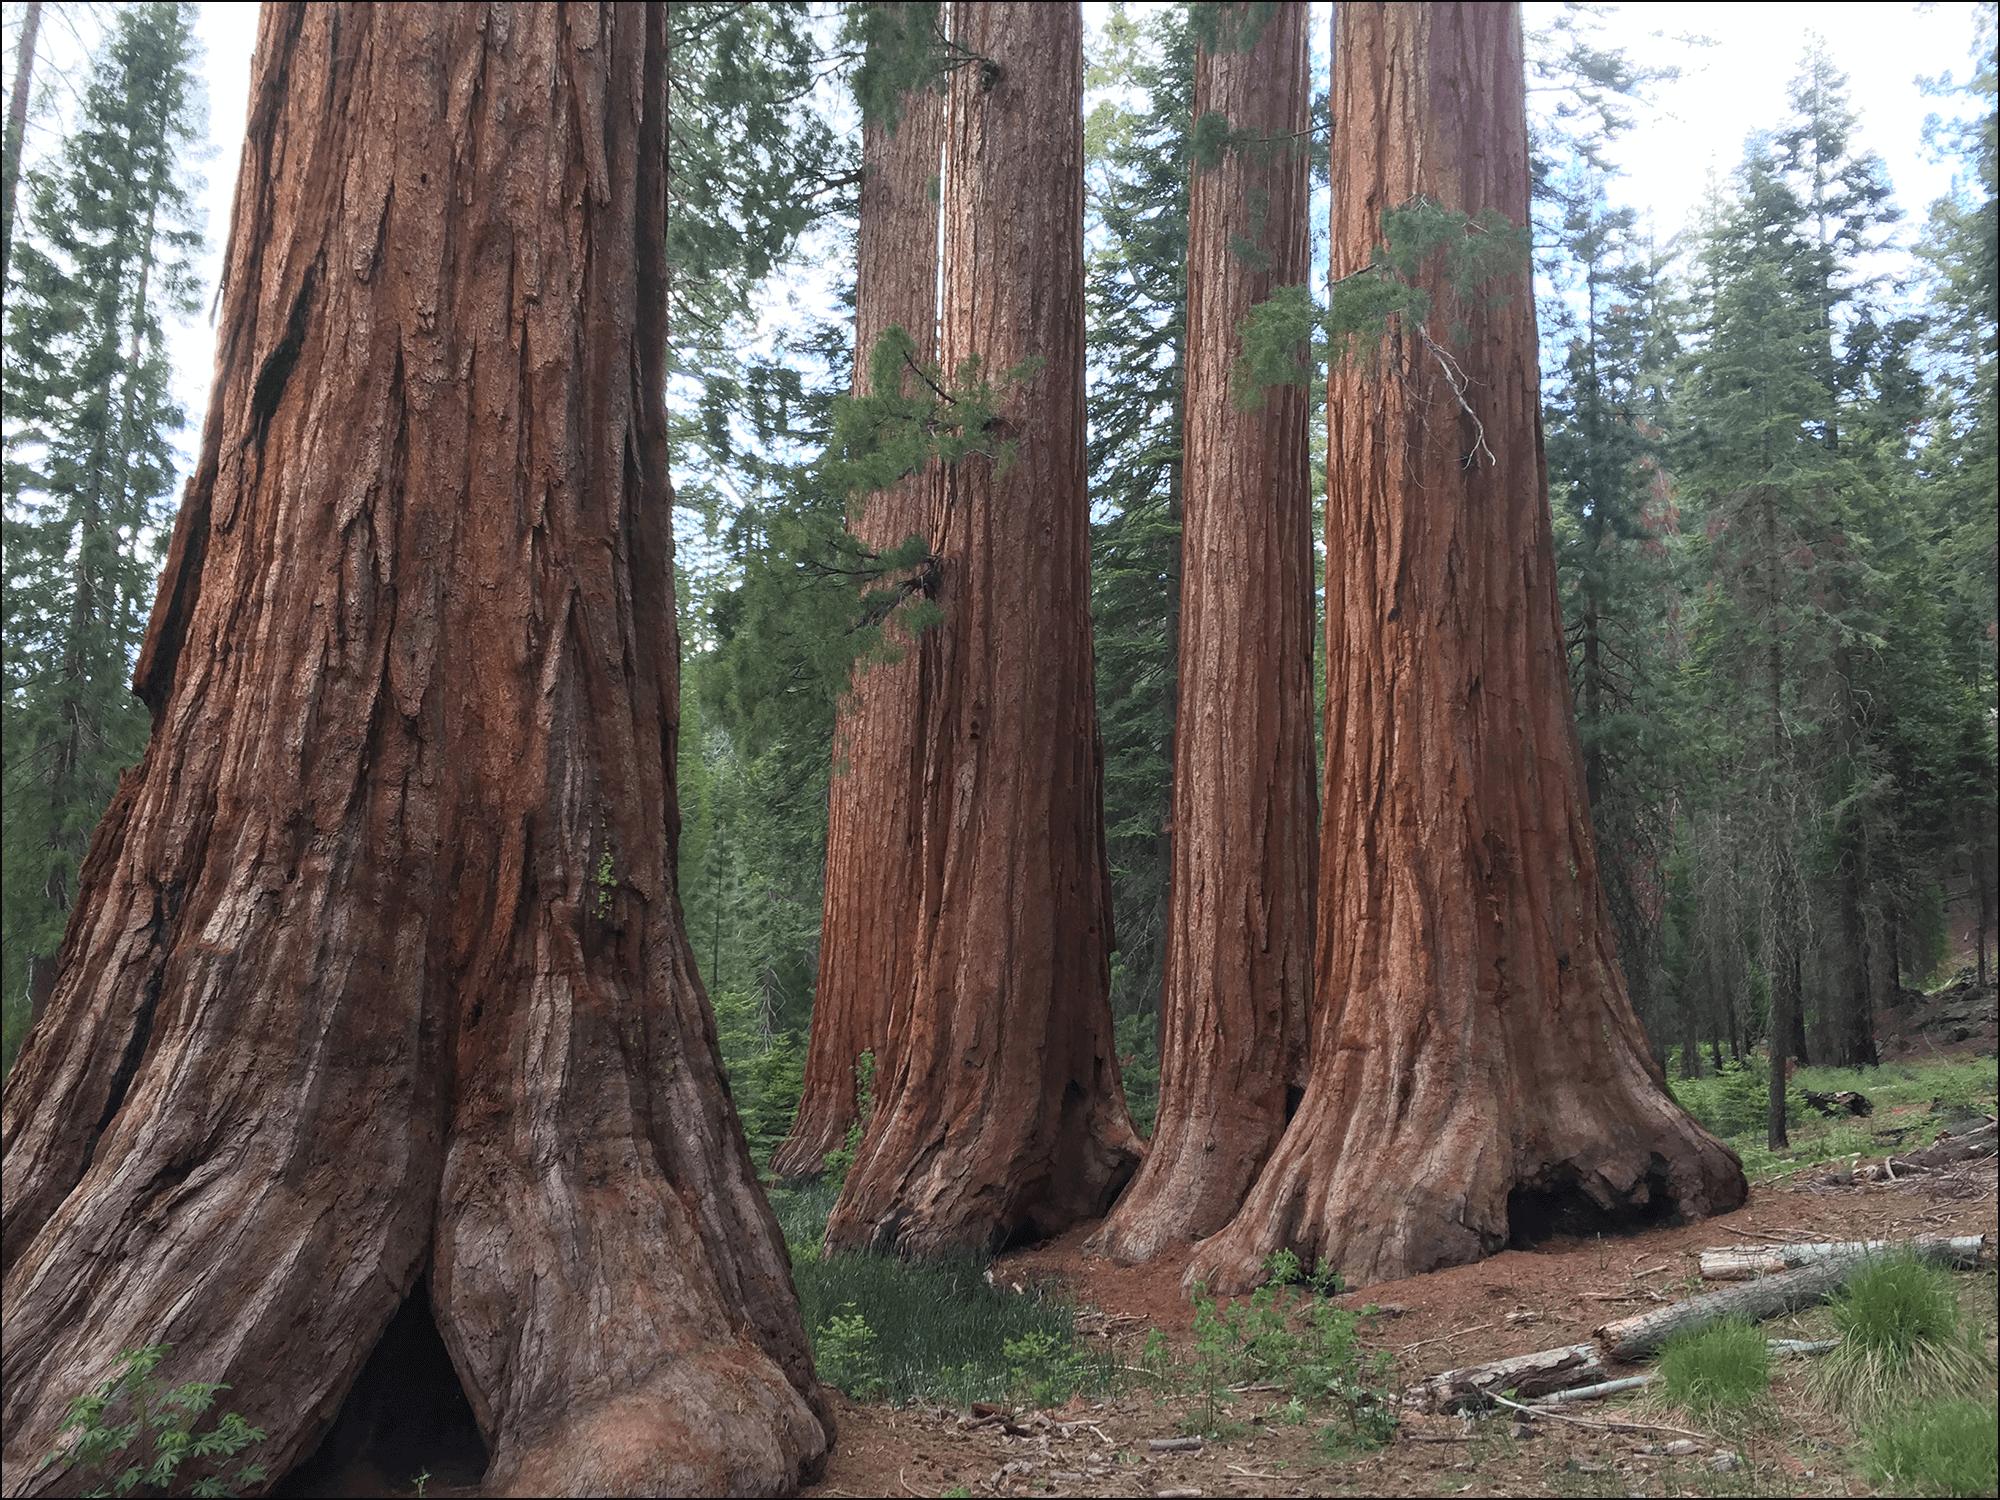 Mammutbäume Sequoias in Yosemite National Park